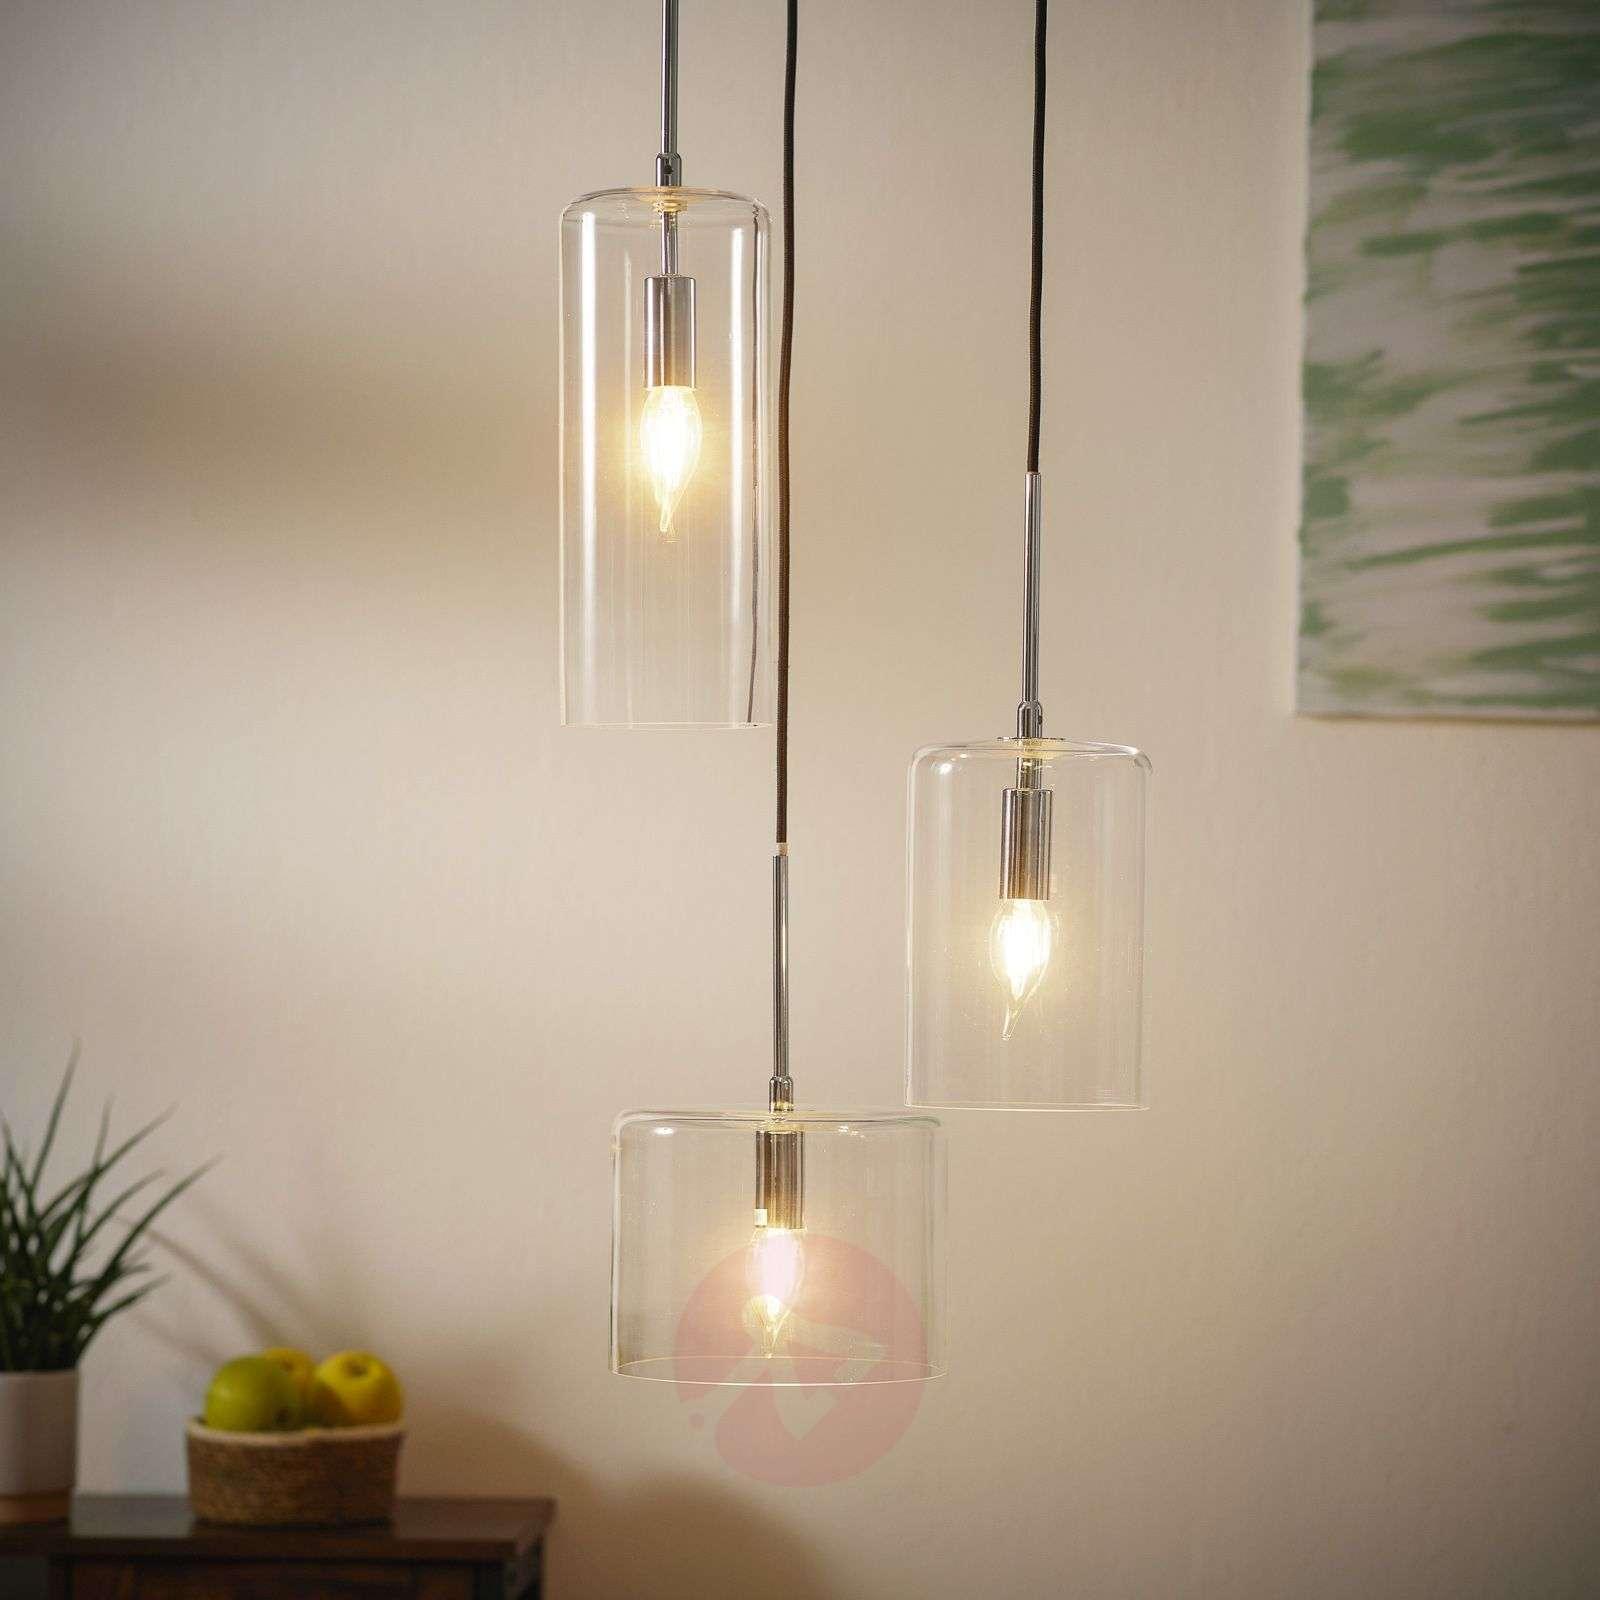 Rockford charming hanging light three-bulb-6057296-02